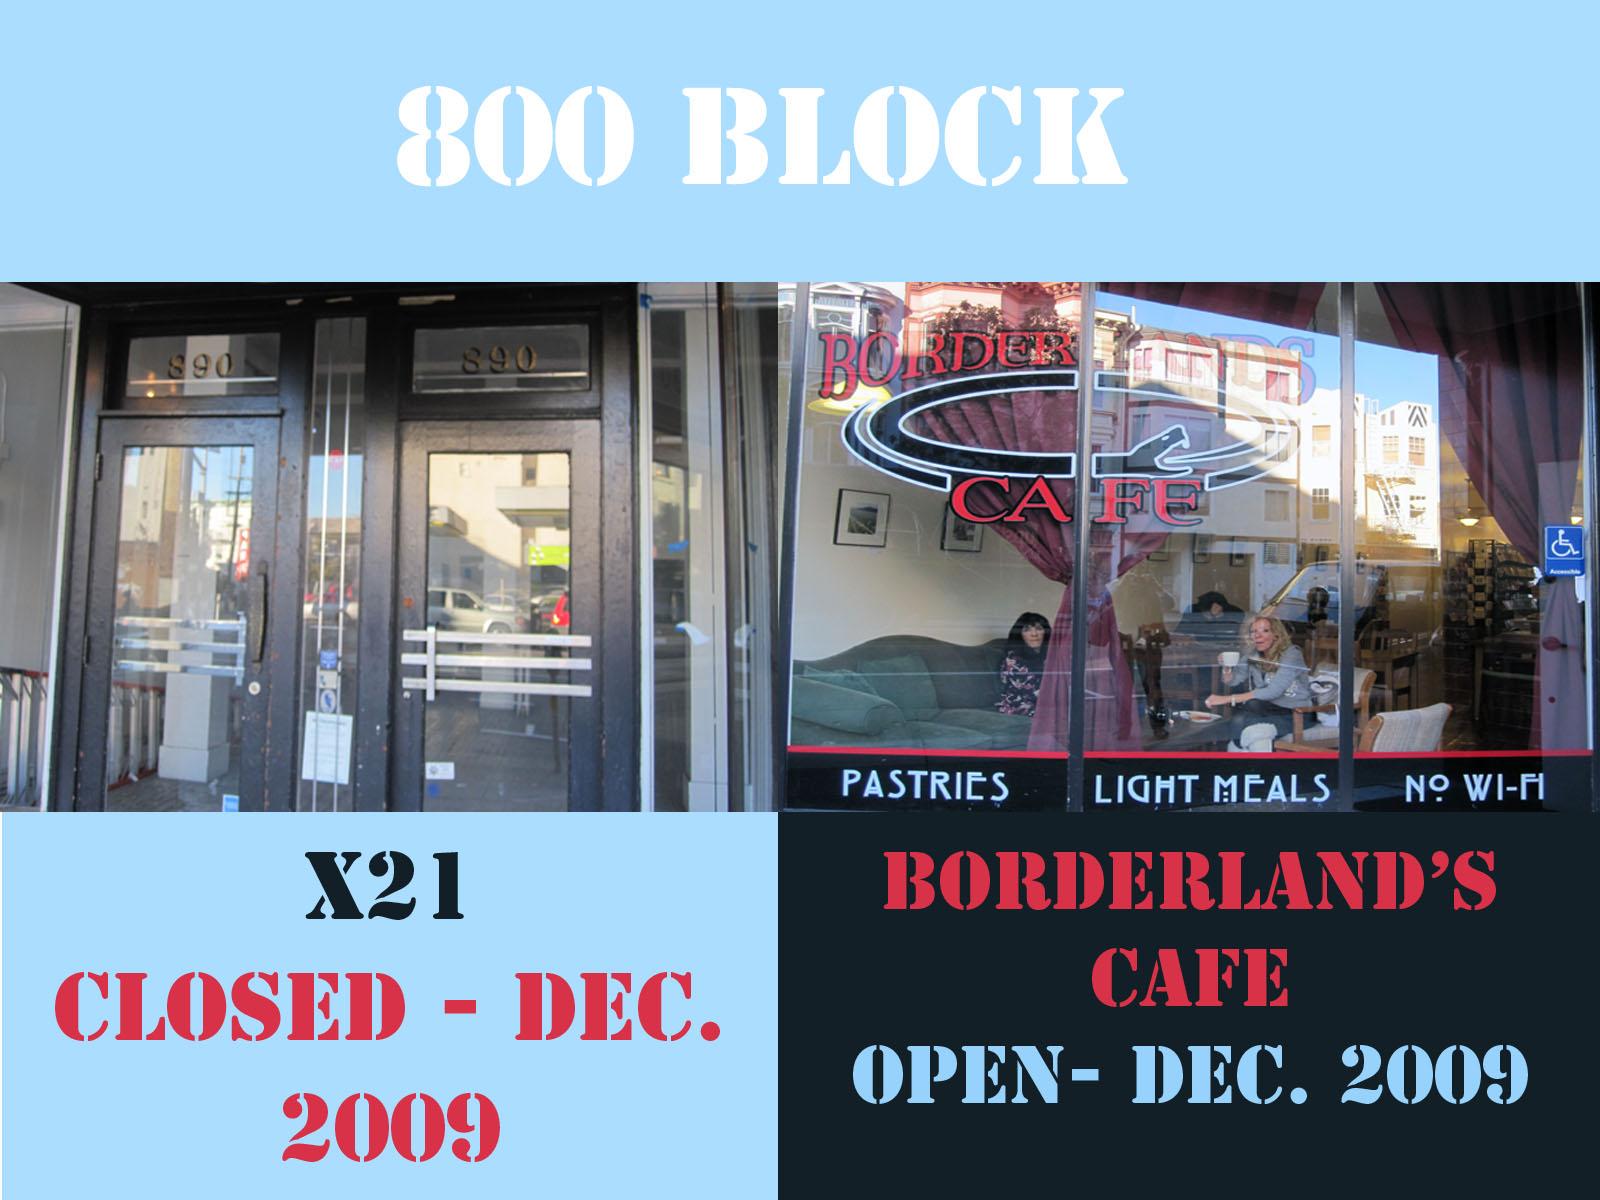 800 Block